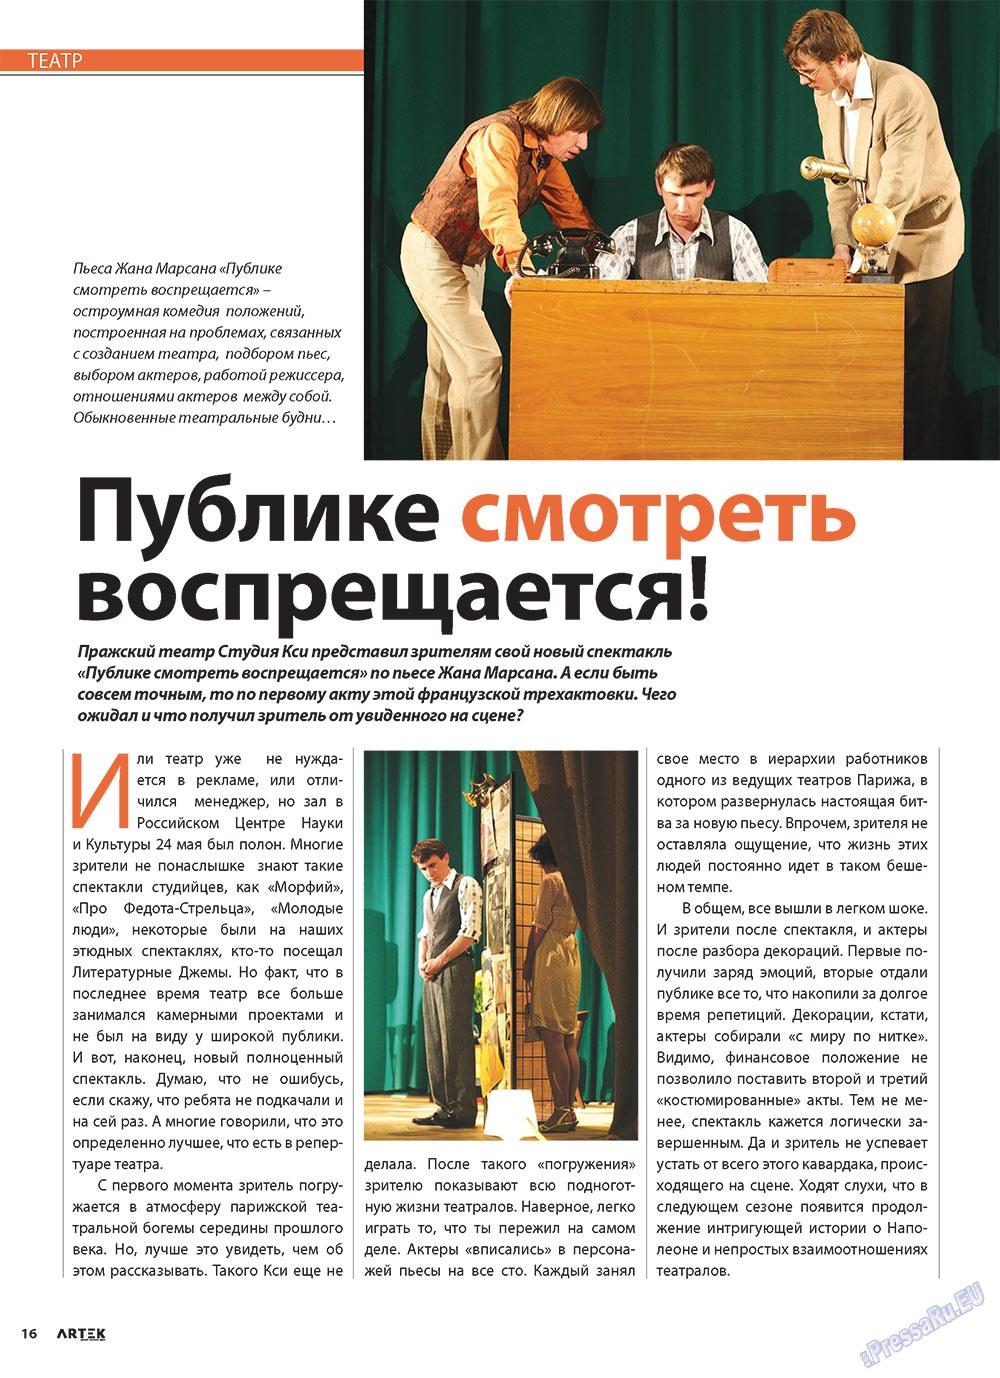 Артек (журнал). 2010 год, номер 4, стр. 18